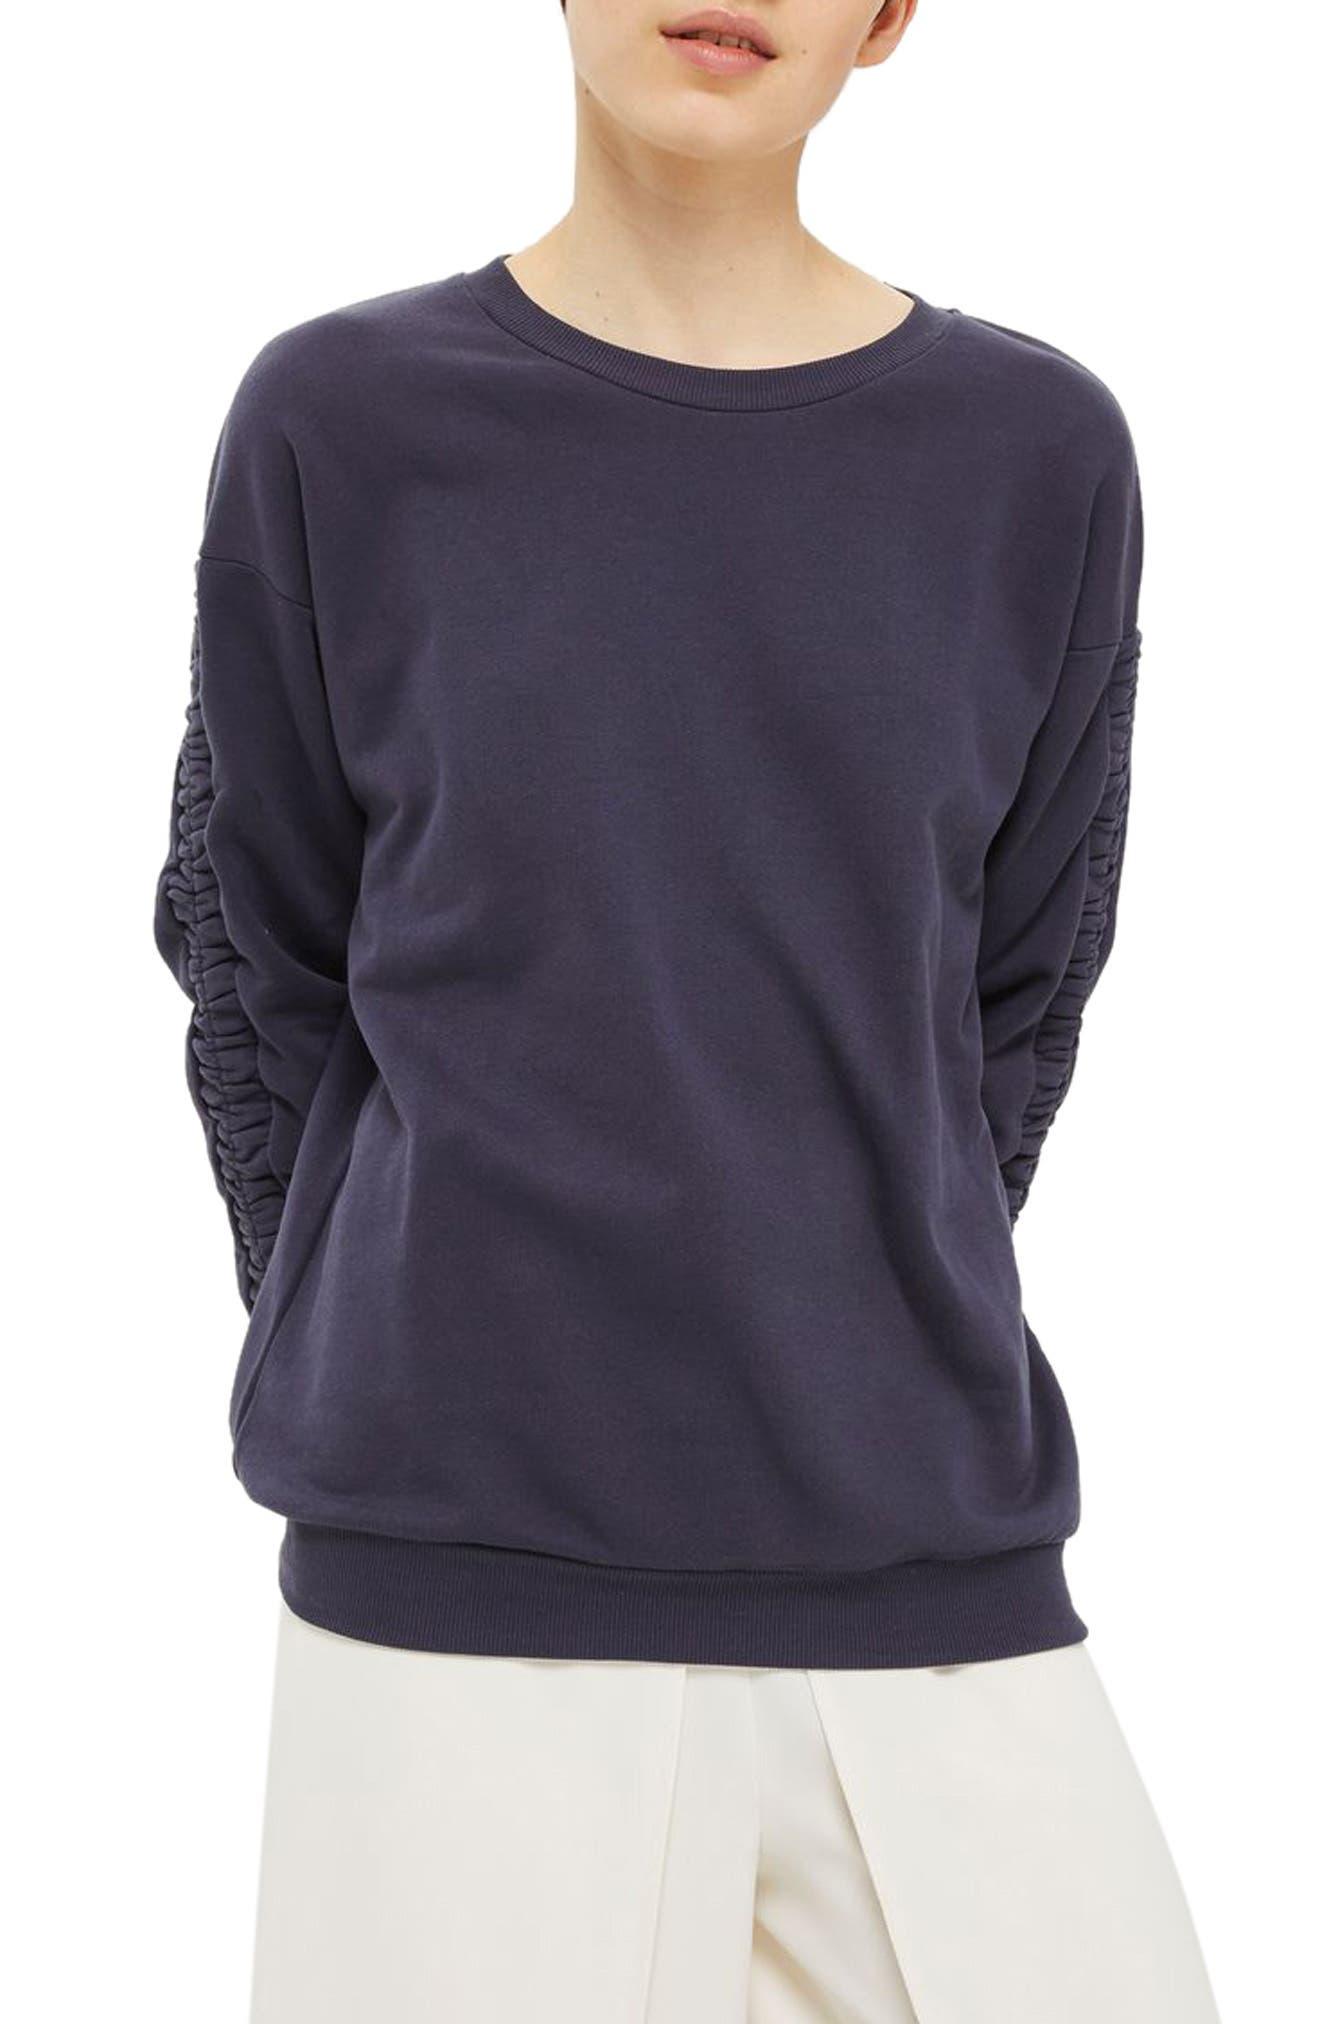 Topshop Ruched Sleeve Sweatshirt